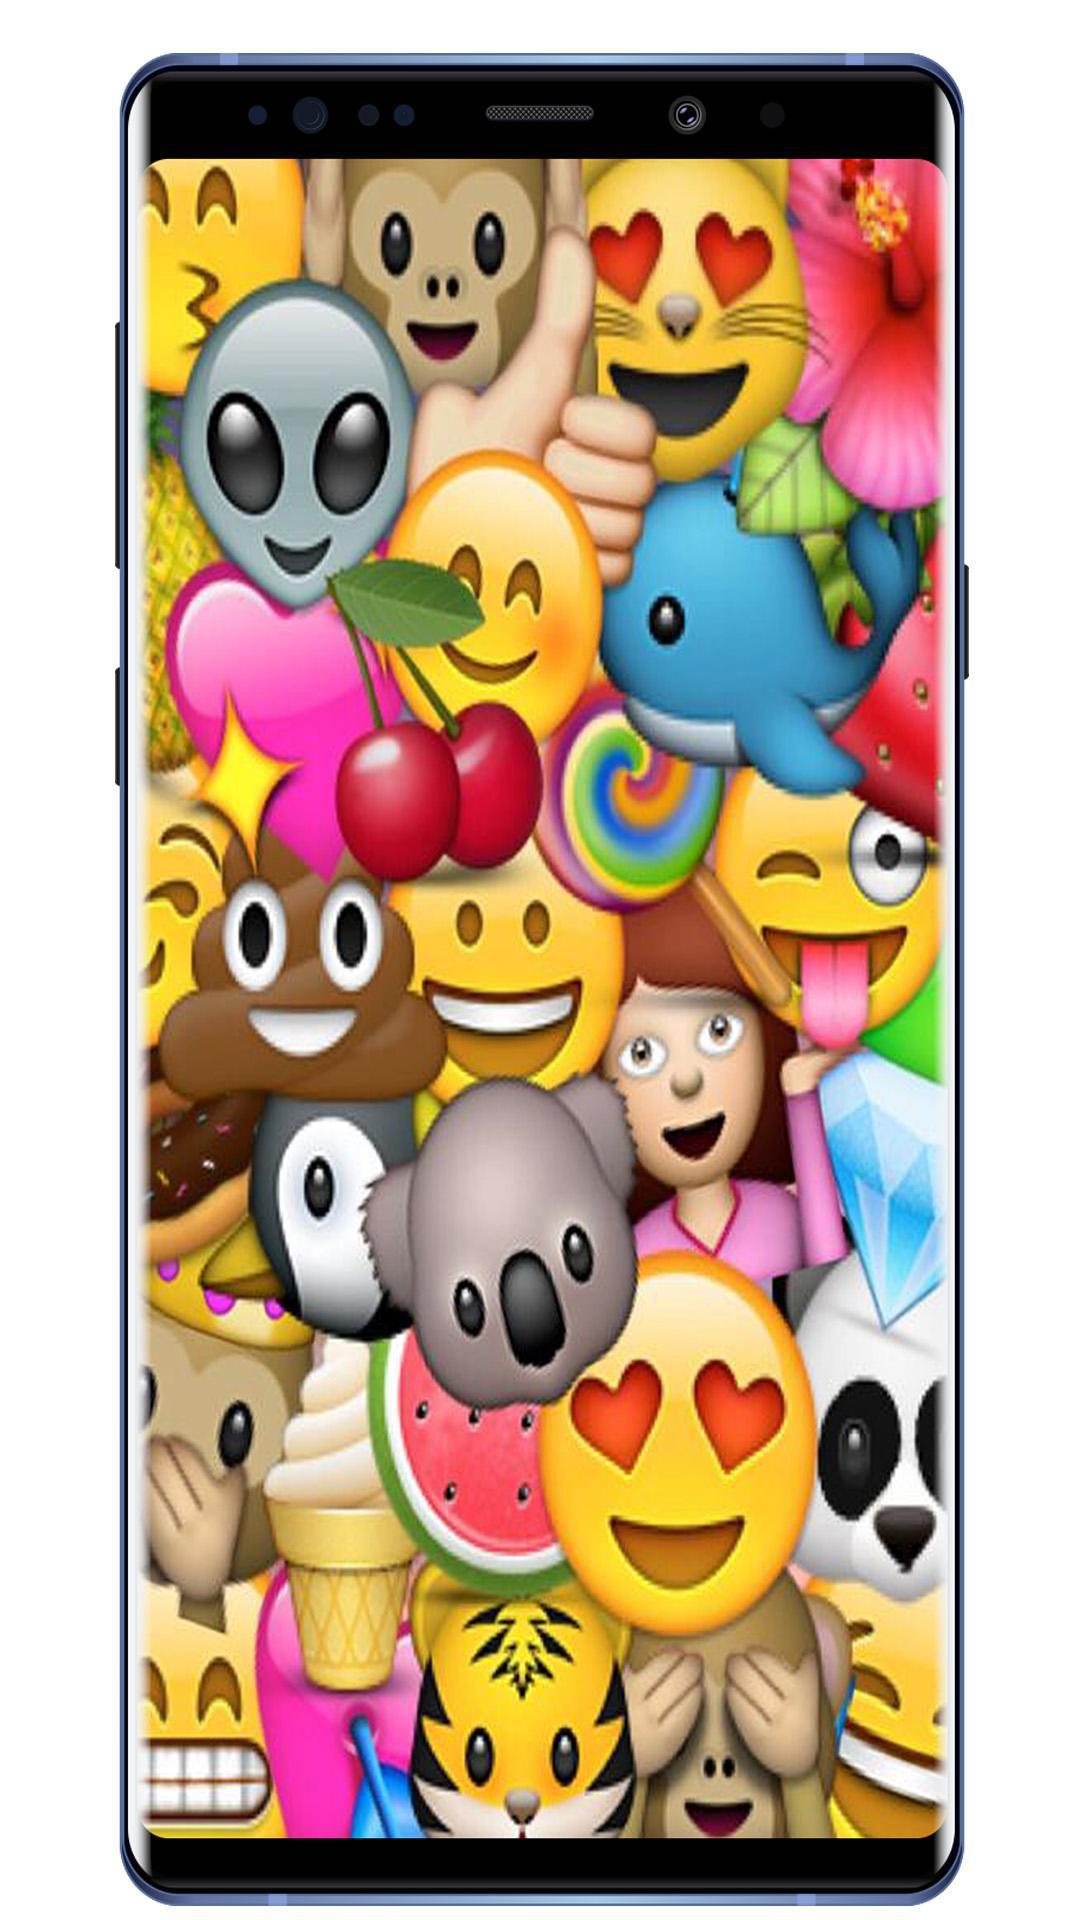 Emoji Wallpaper Cute Emoji Background For Android APK